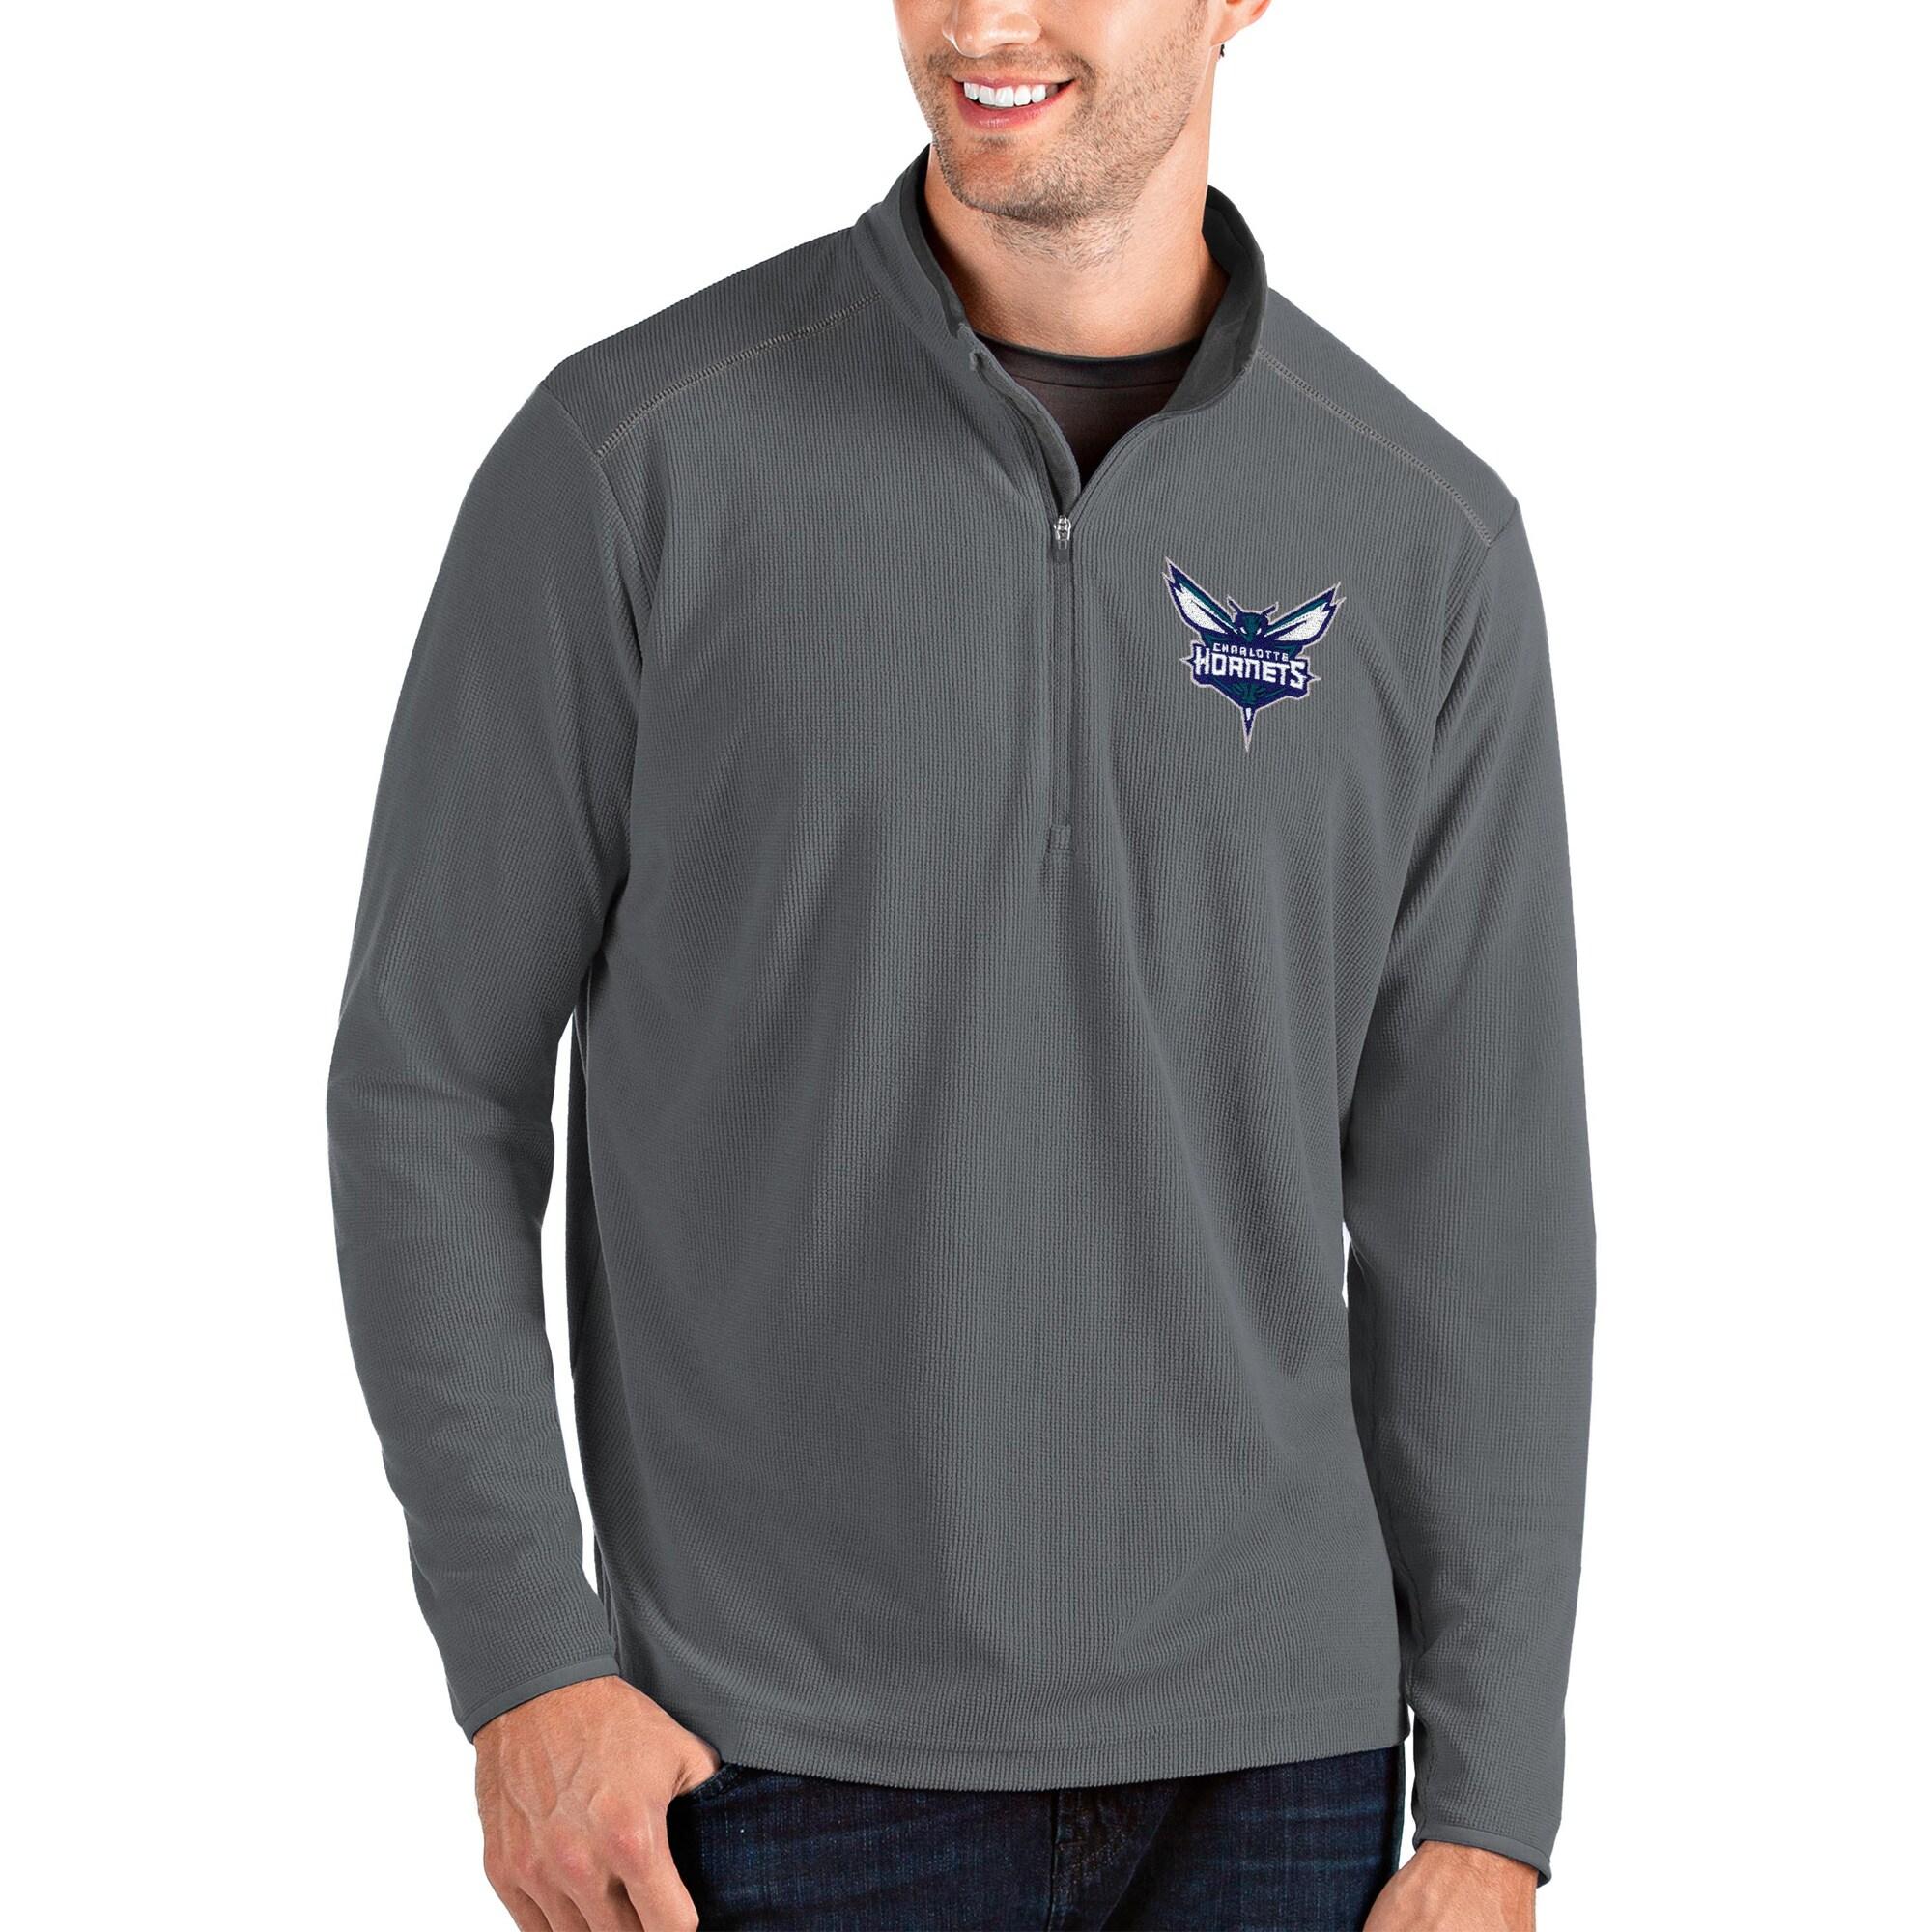 Charlotte Hornets Antigua Glacier Quarter-Zip Pullover Jacket - Charcoal/Gray